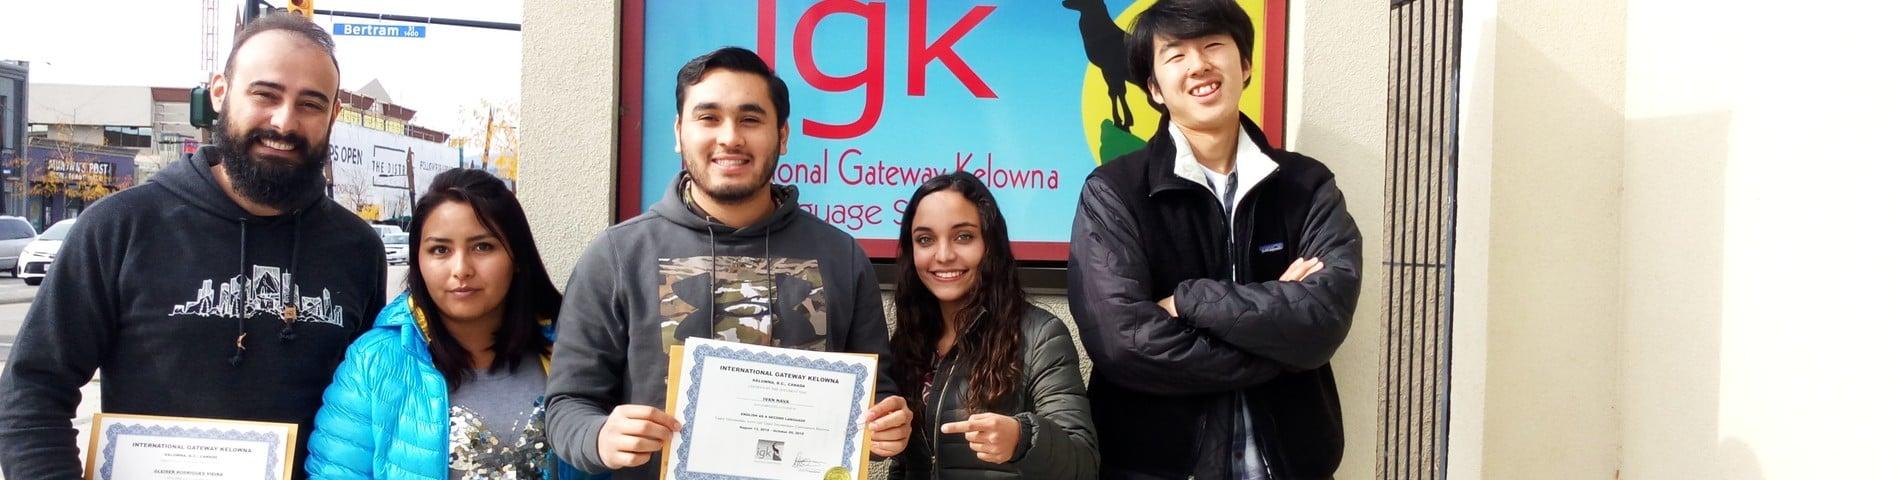 International Gateway Kelowna画像1